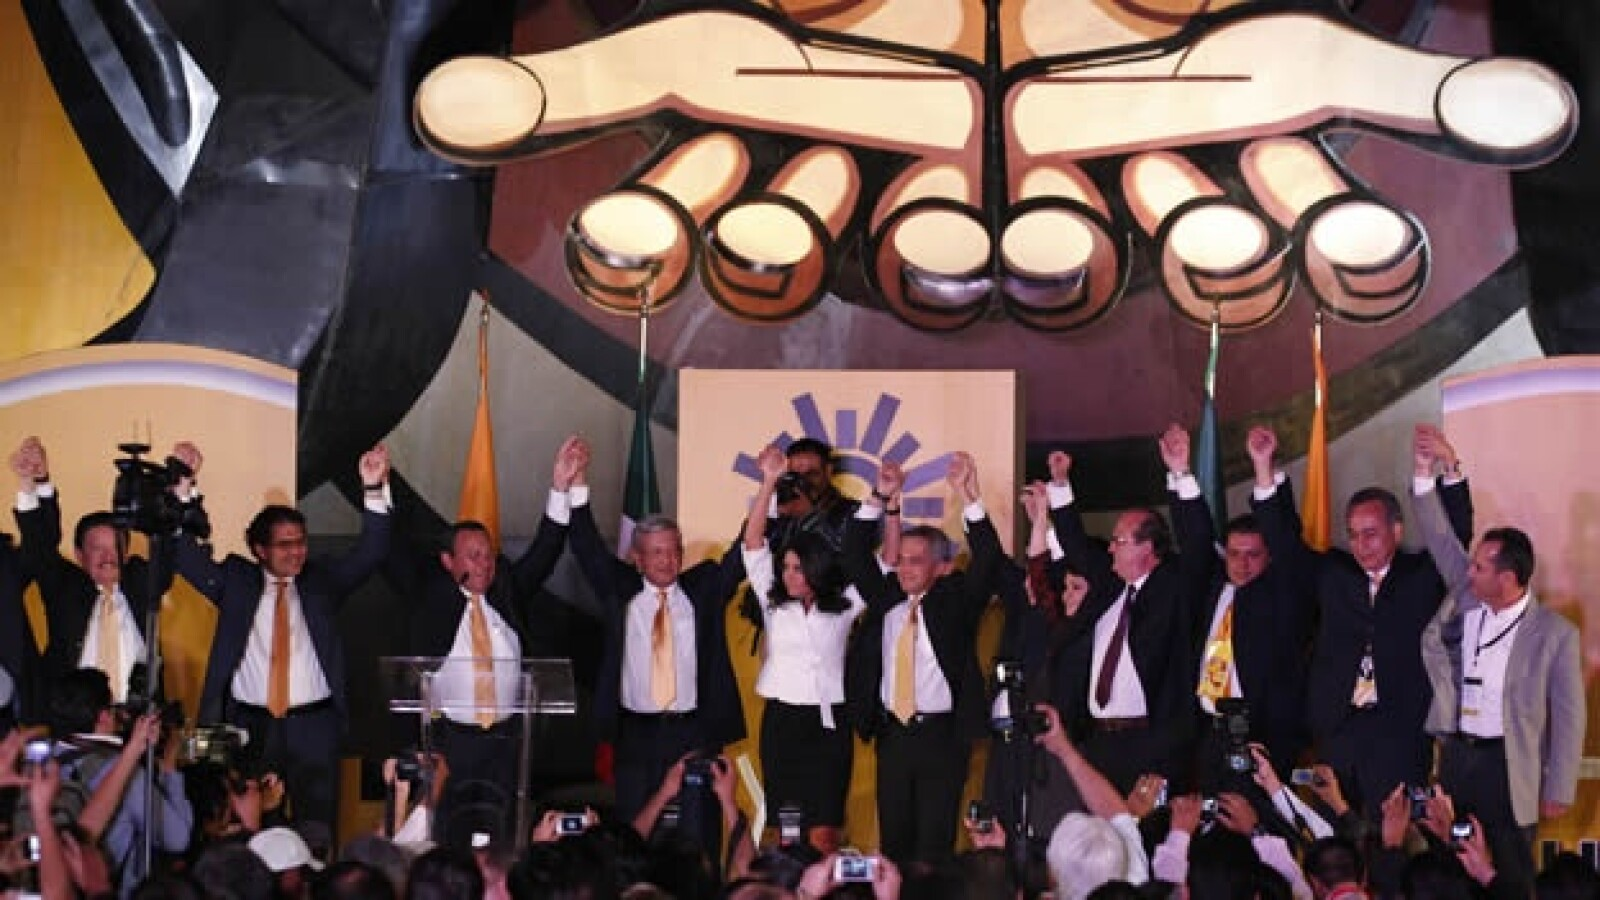 16 de marzo-lopez obrador toma protesta como candidato del prd